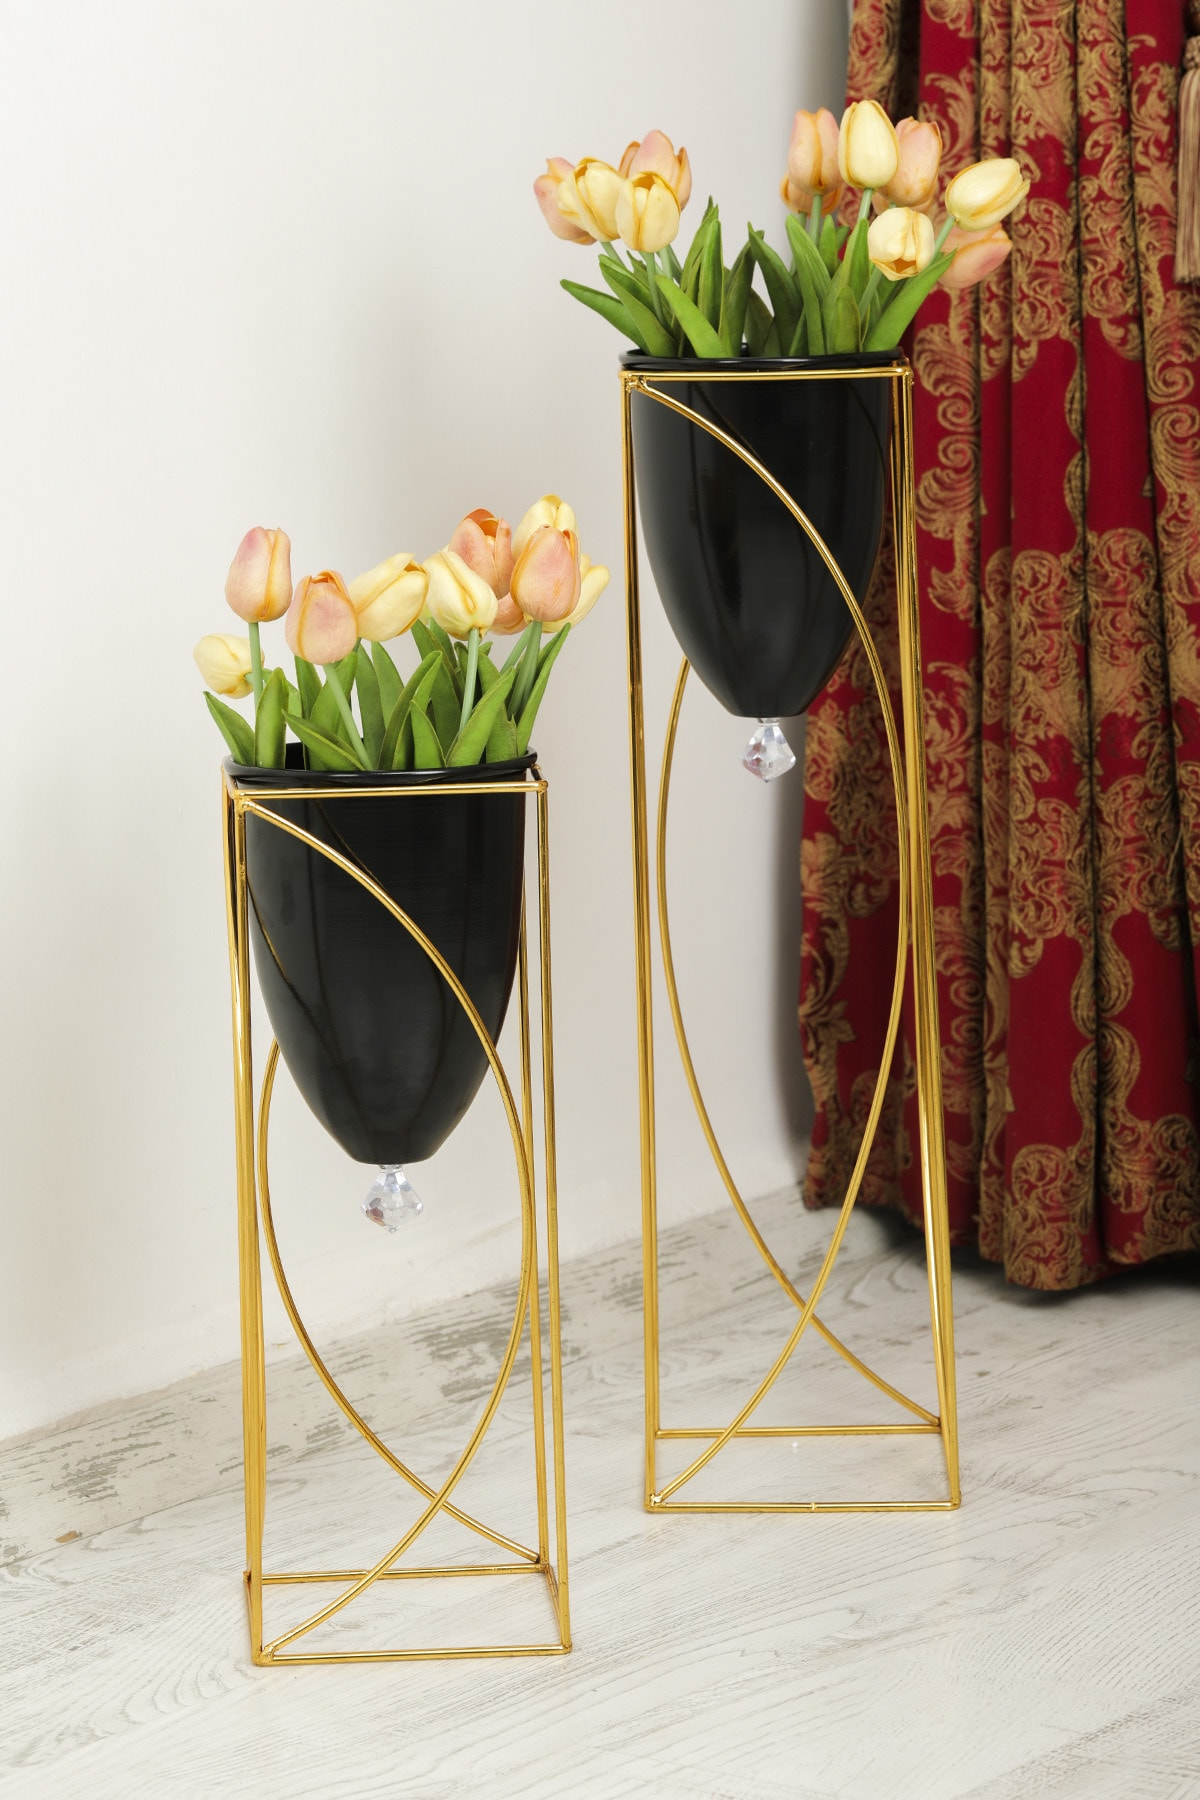 Metal Siyah Dekoratif Ayaklı Saksı,2'li Gold Ayaklı Saksı,dekoratif Saksı,vazo